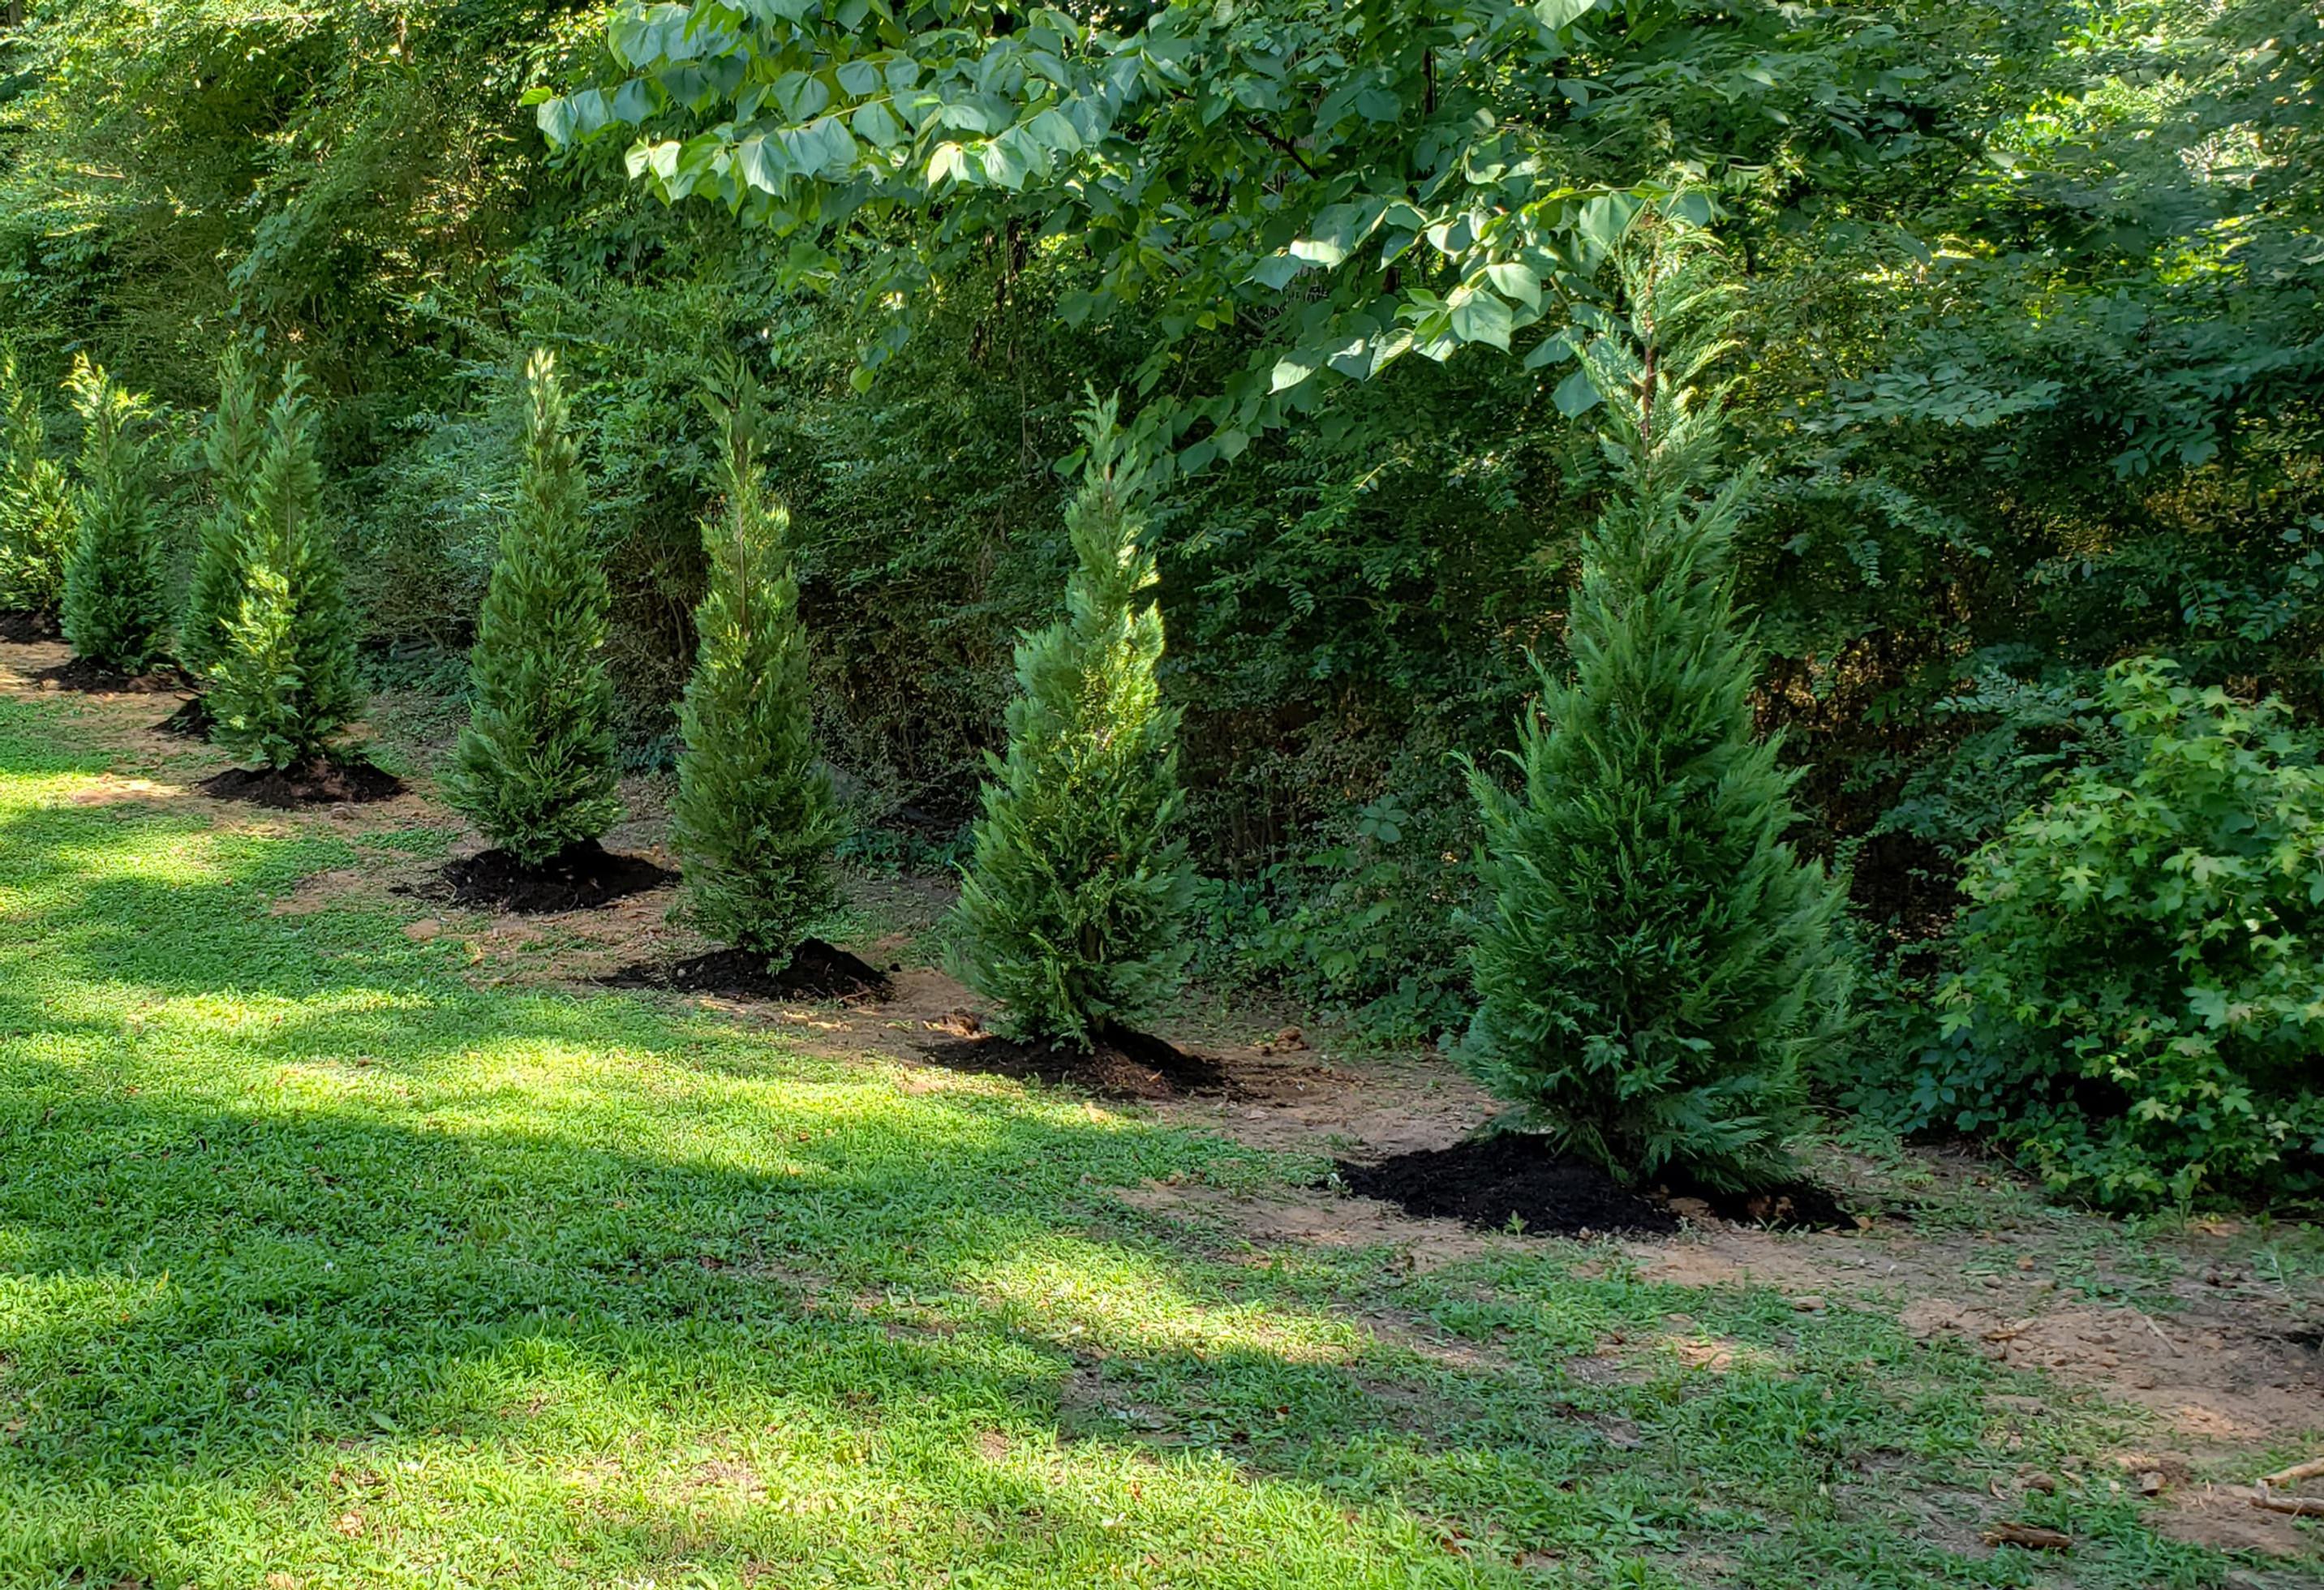 Mature height of leylandi cypress